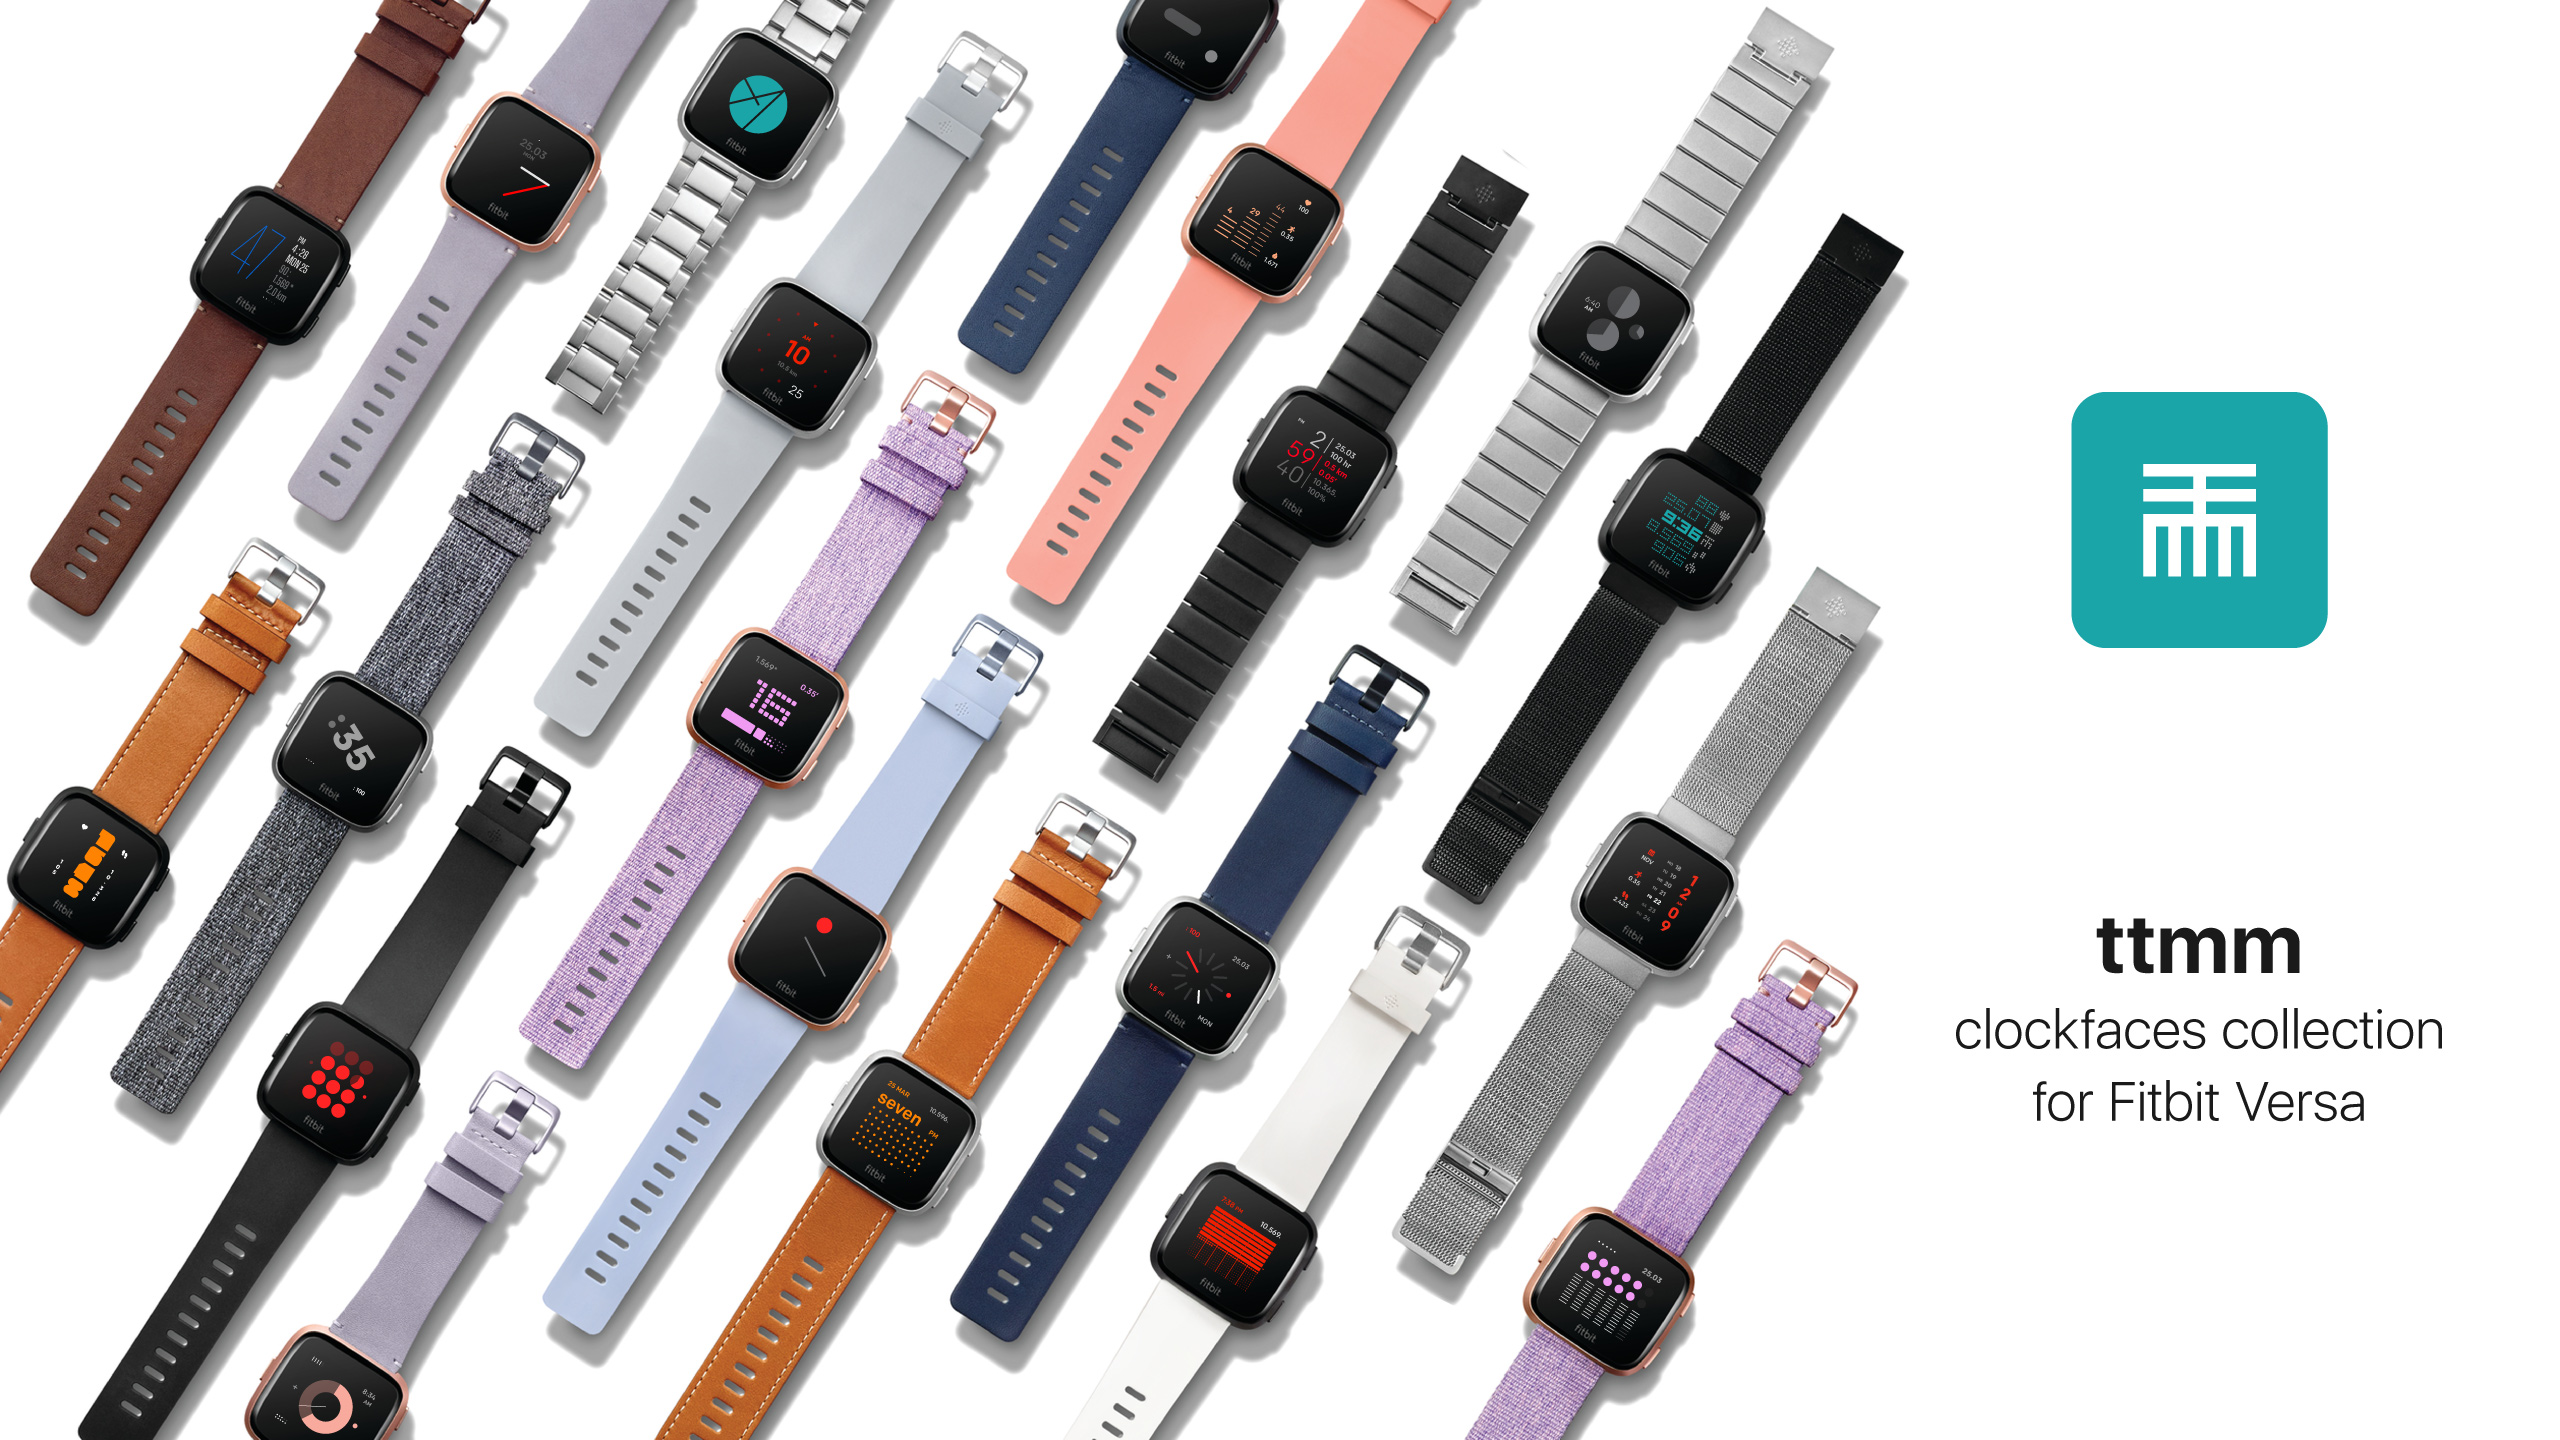 TTMM for Fitbit Versa